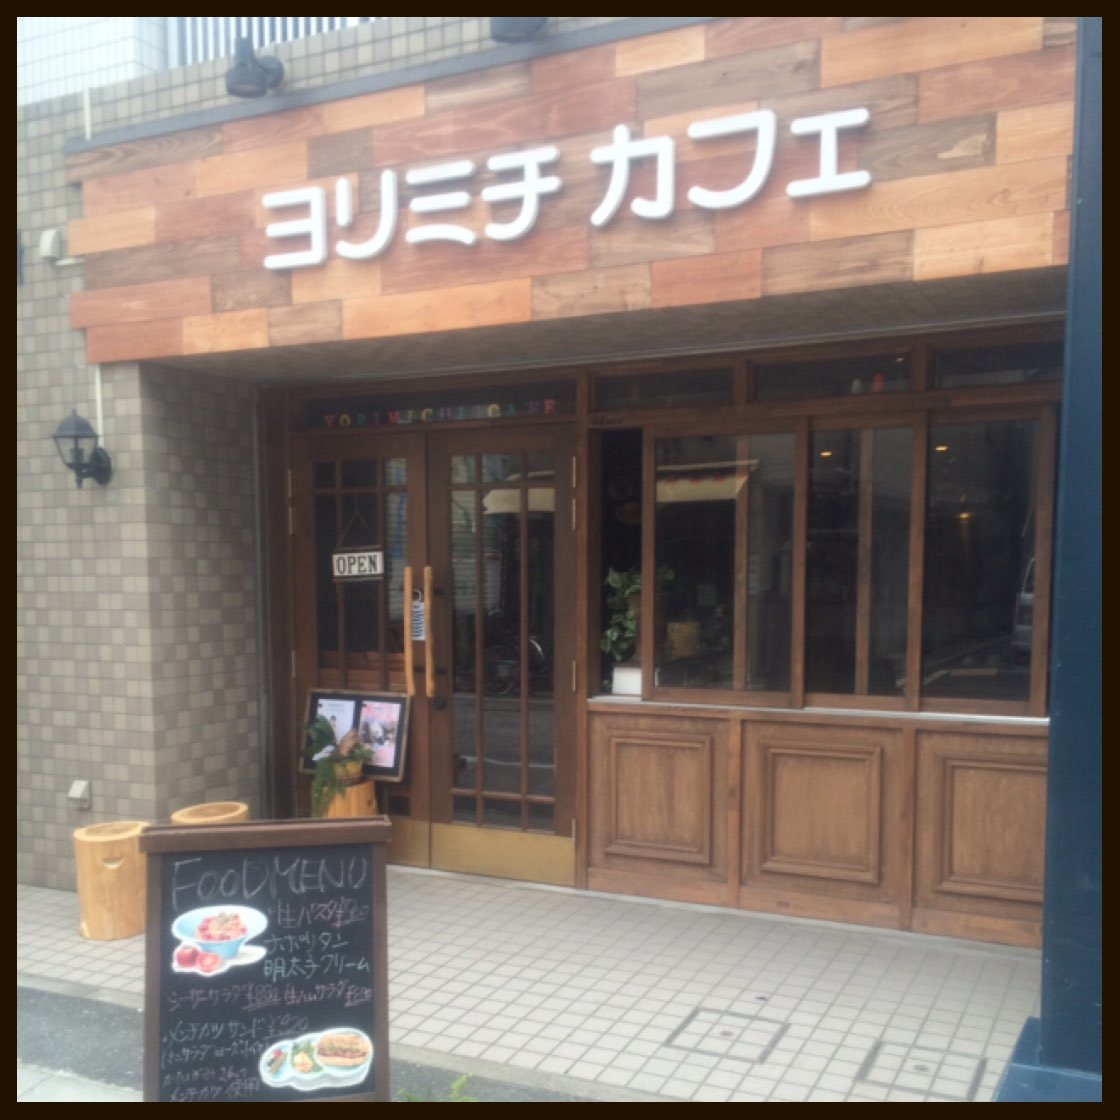 http://doppo.me/site/wp-content/uploads/2016/03/yorimichicafe.jpg